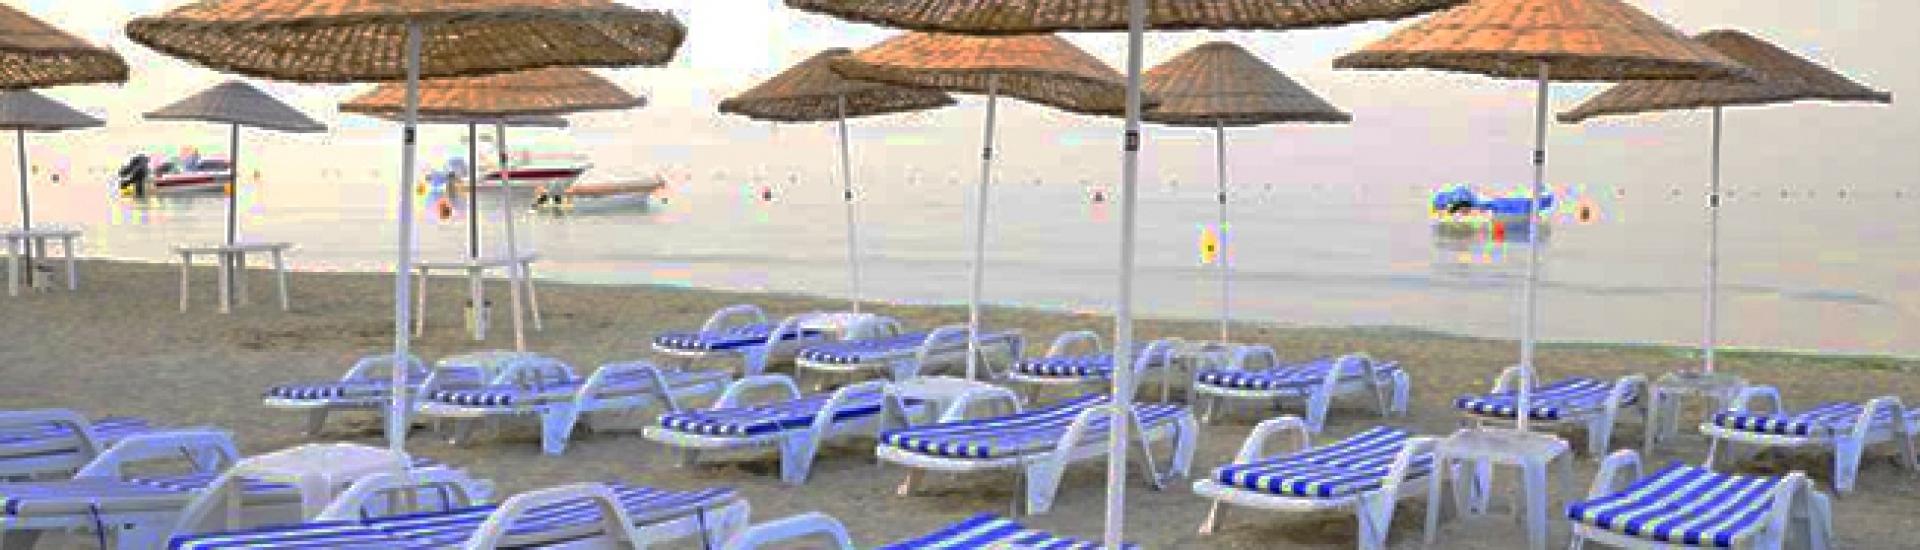 Почивка на Мраморно море в Кумбургаз-hotel Ronax -3*